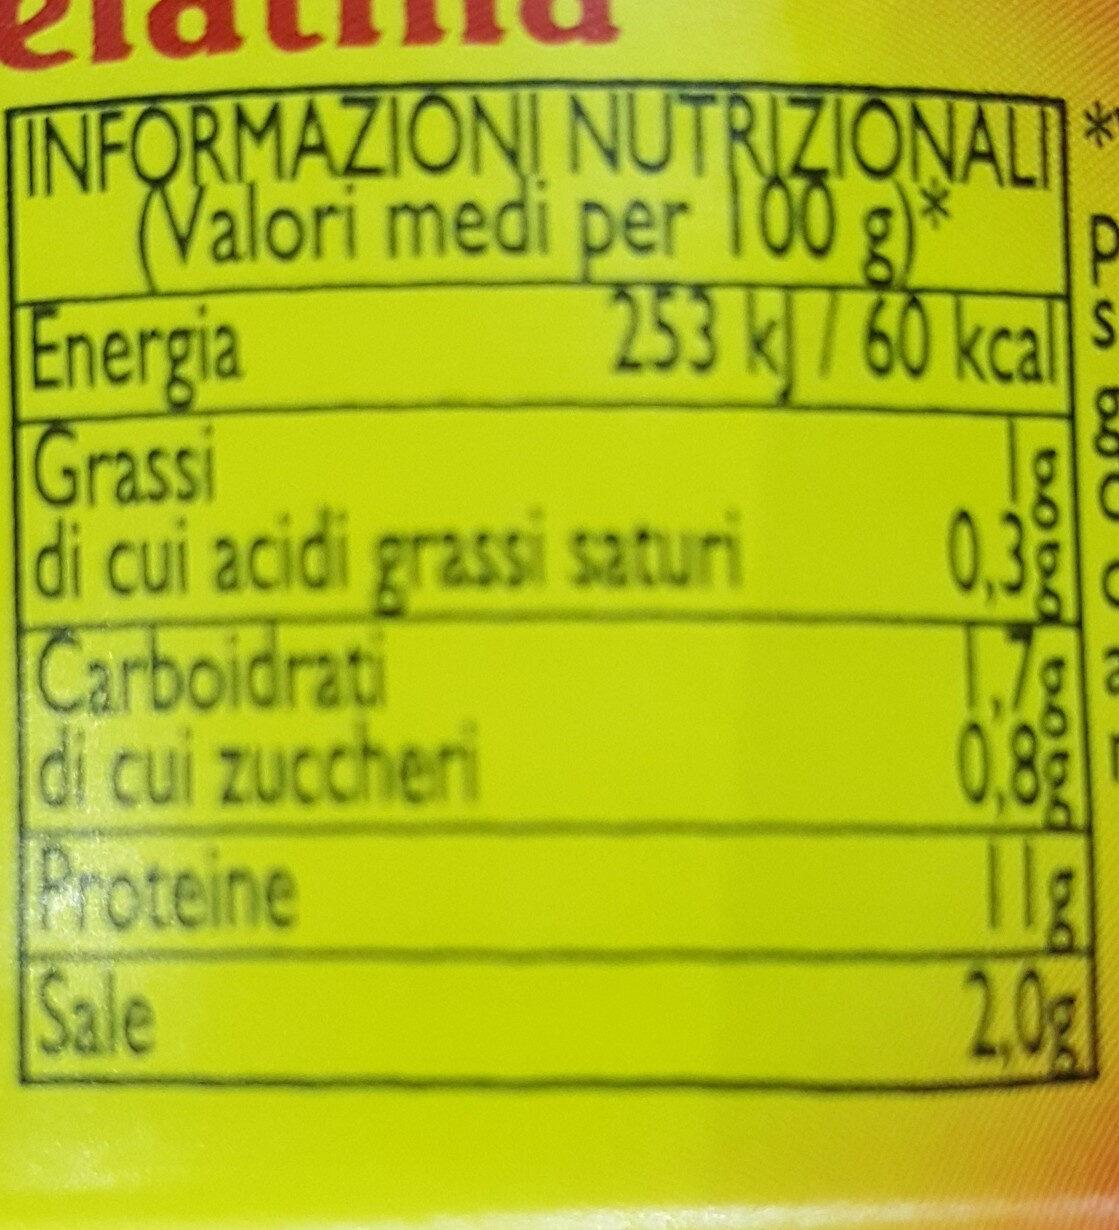 Dorada - Nutrition facts - it